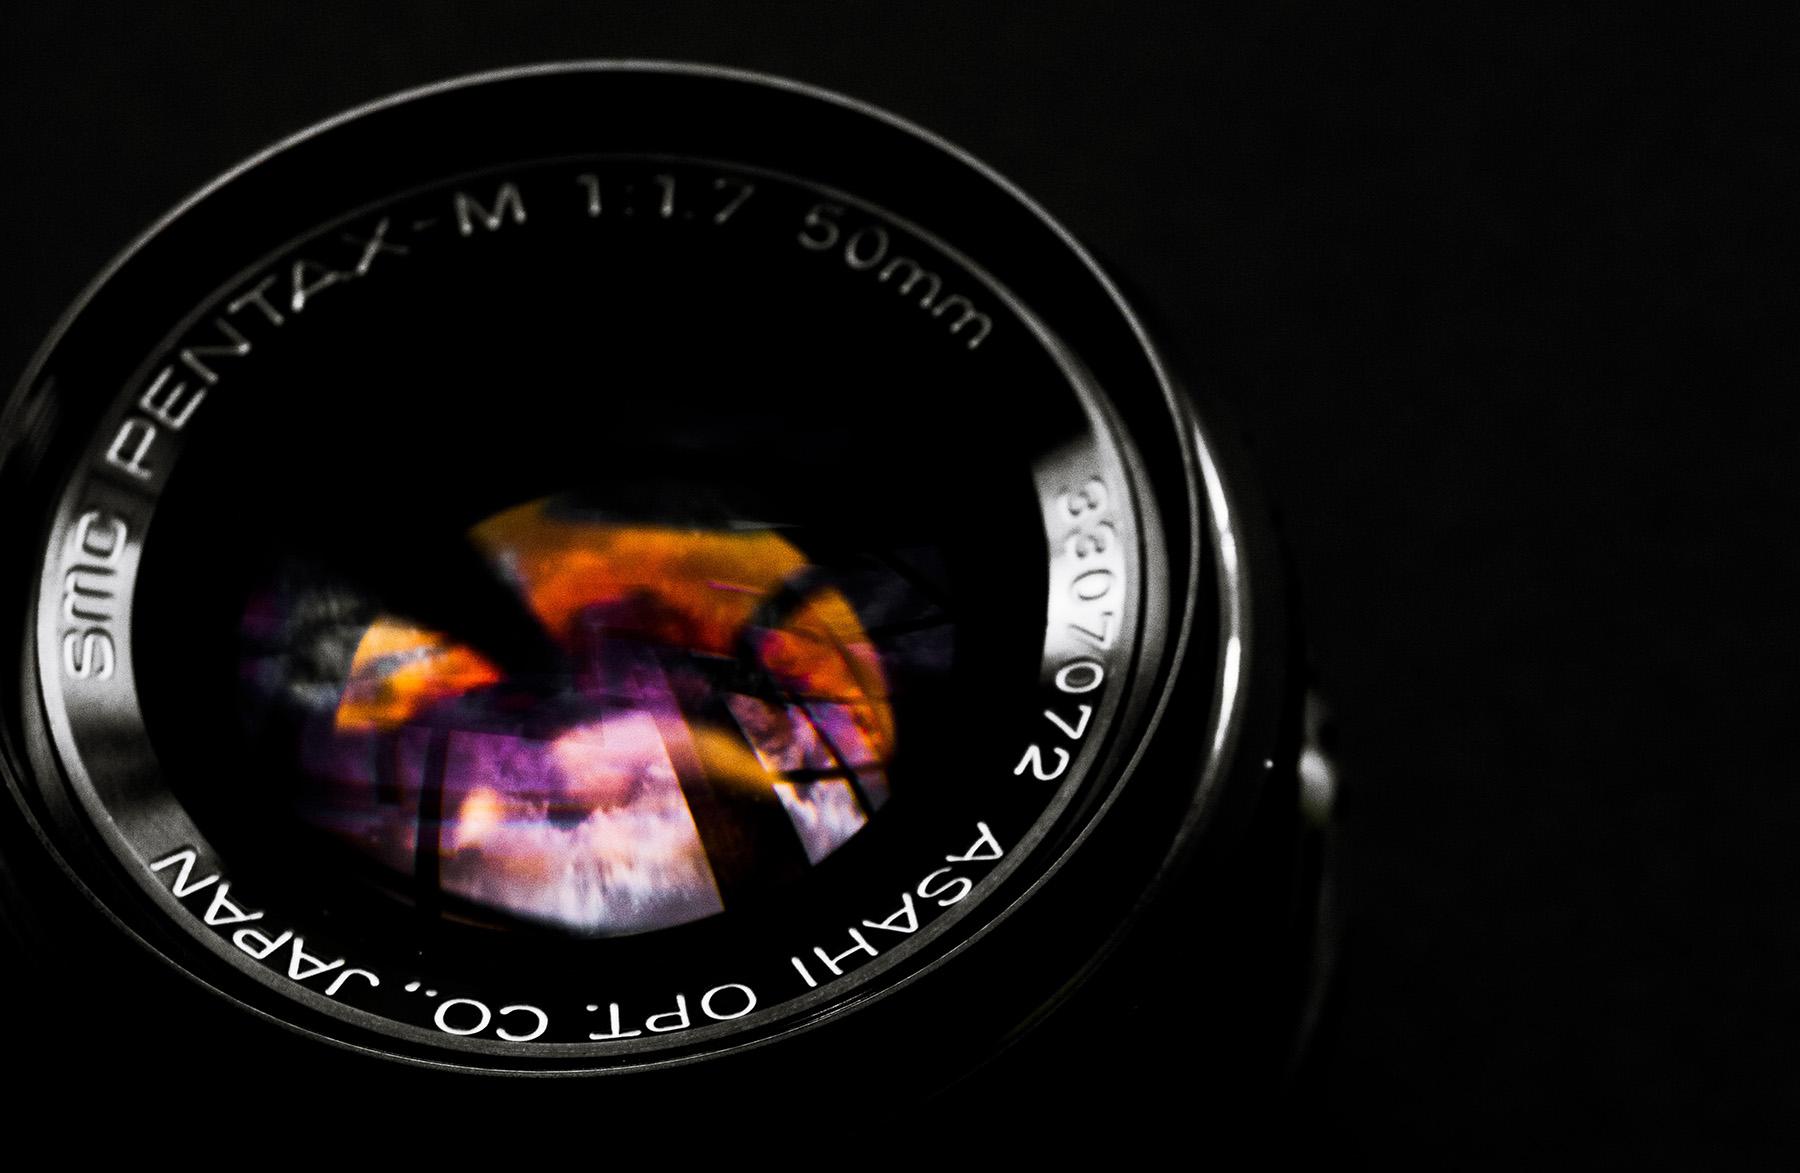 Réussir ses photos en 7 conseils